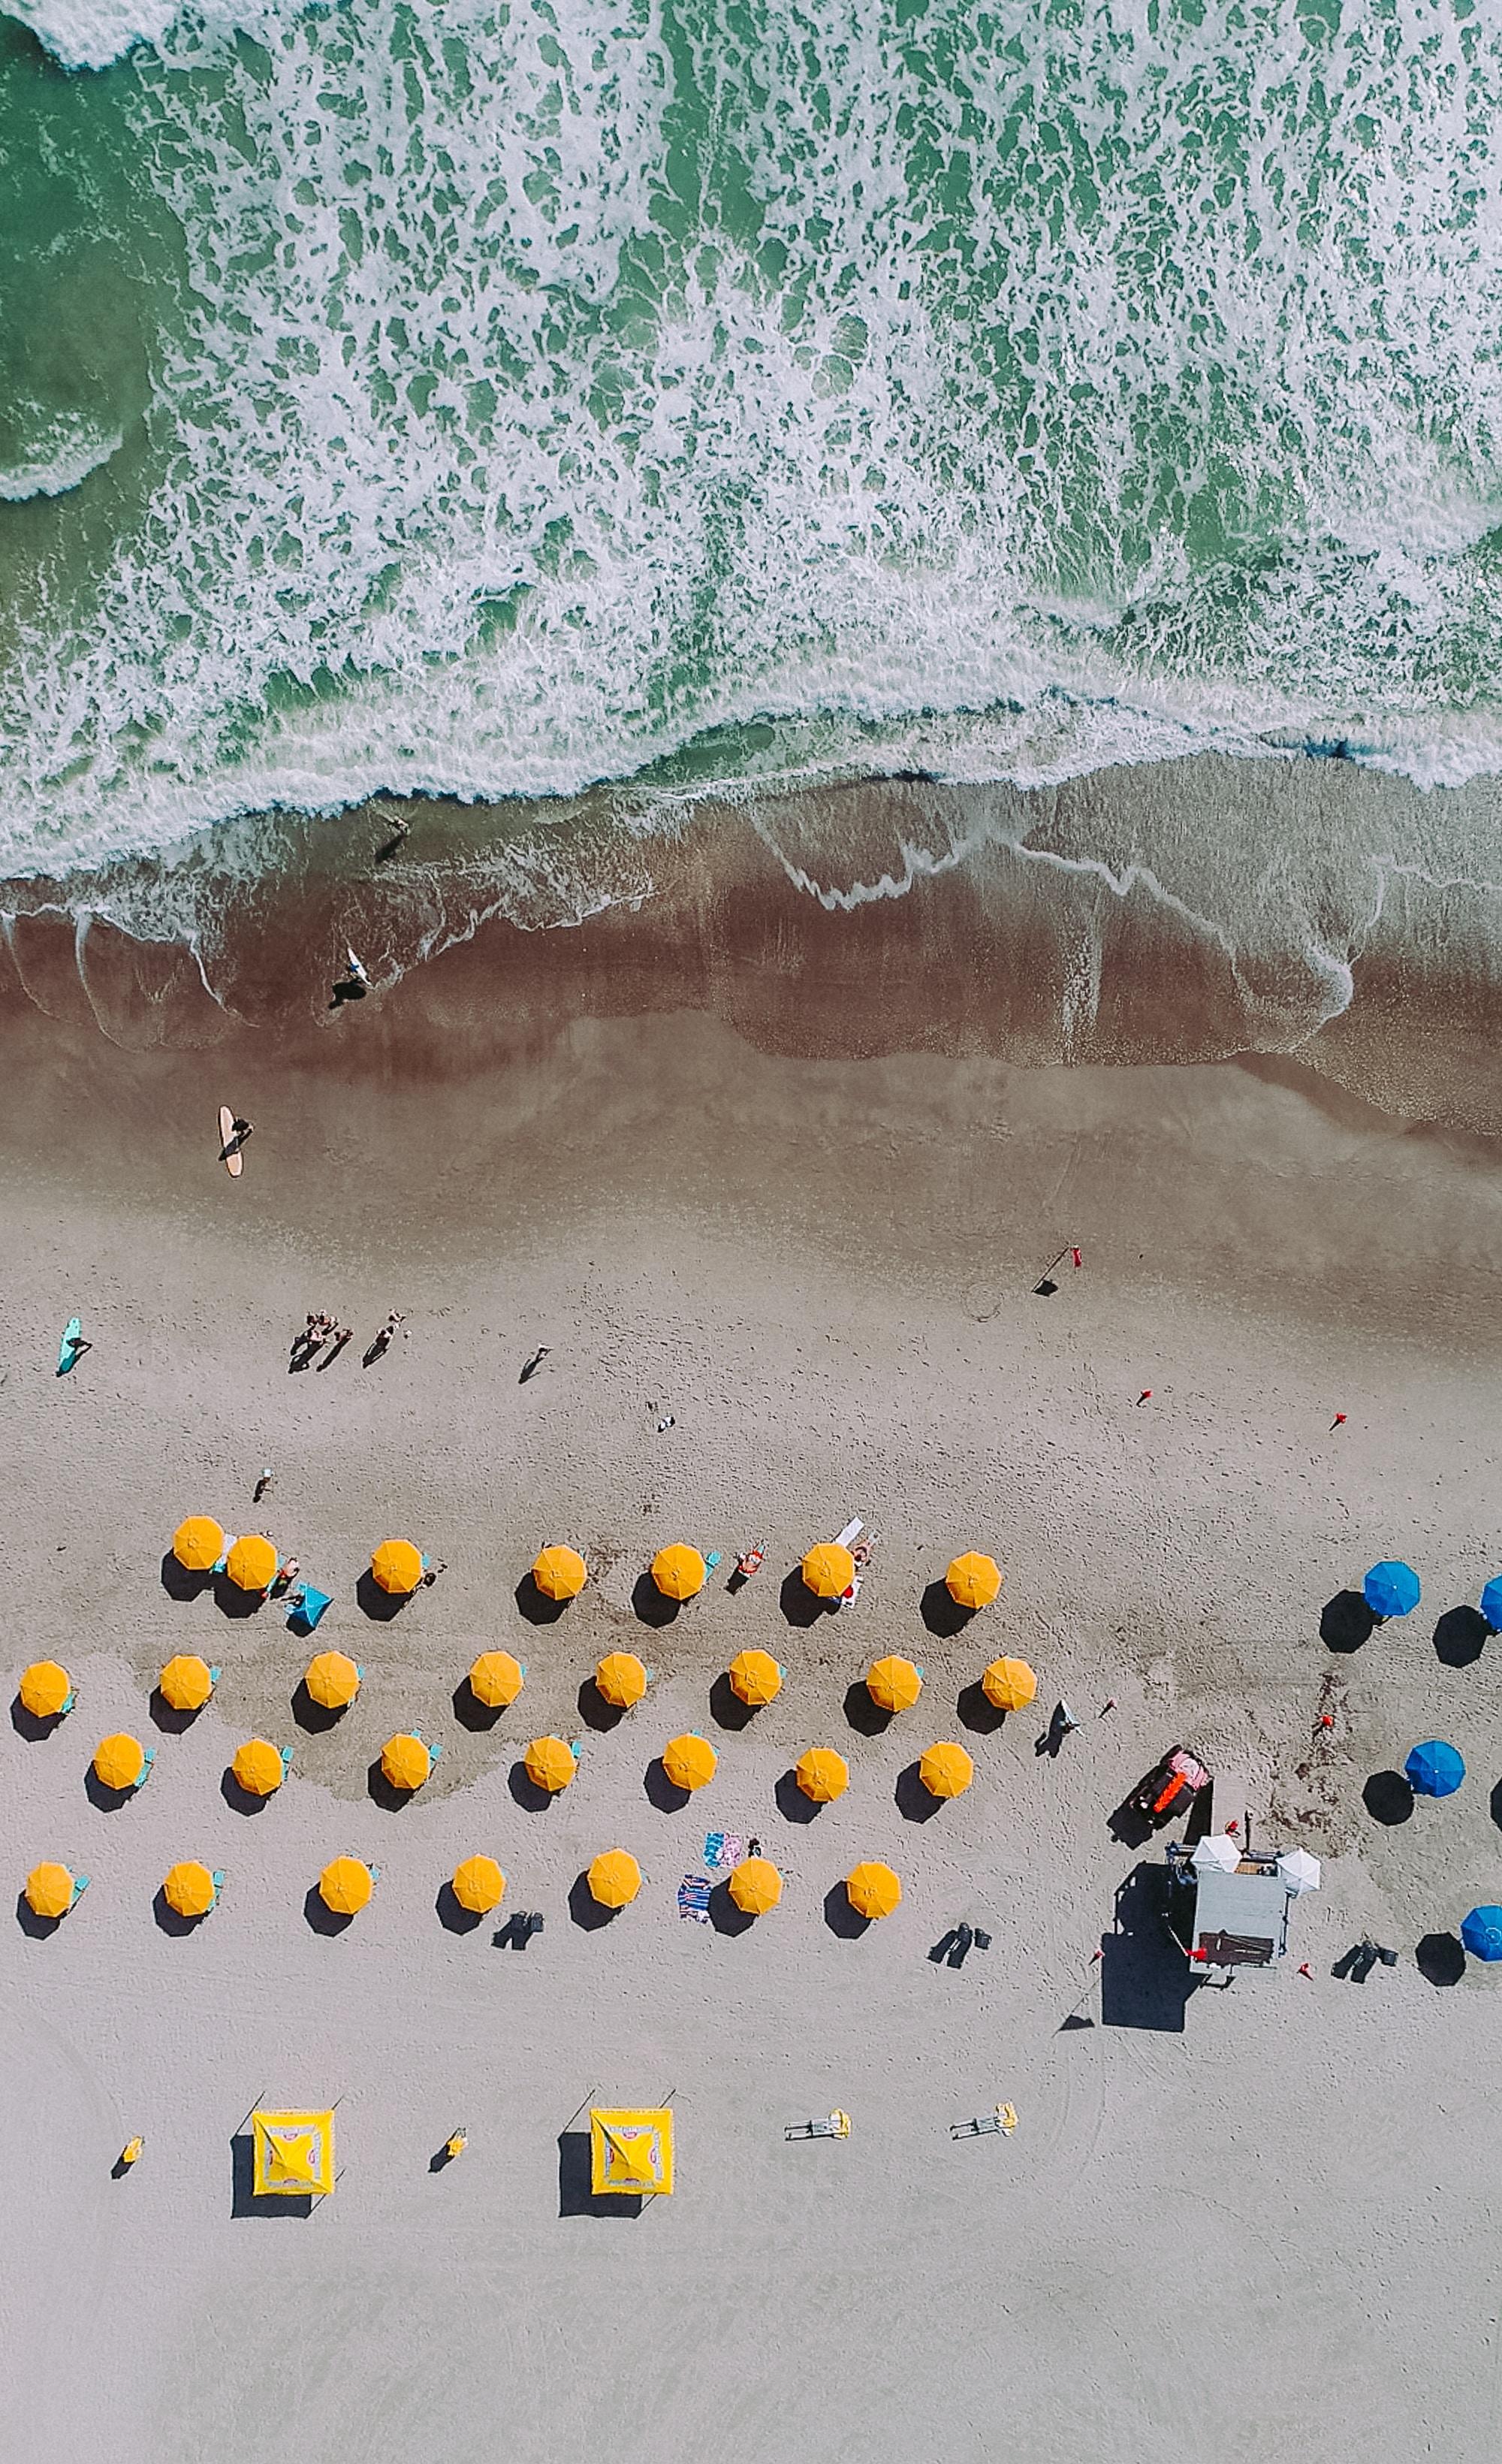 aerial photography of umbrellas on beach